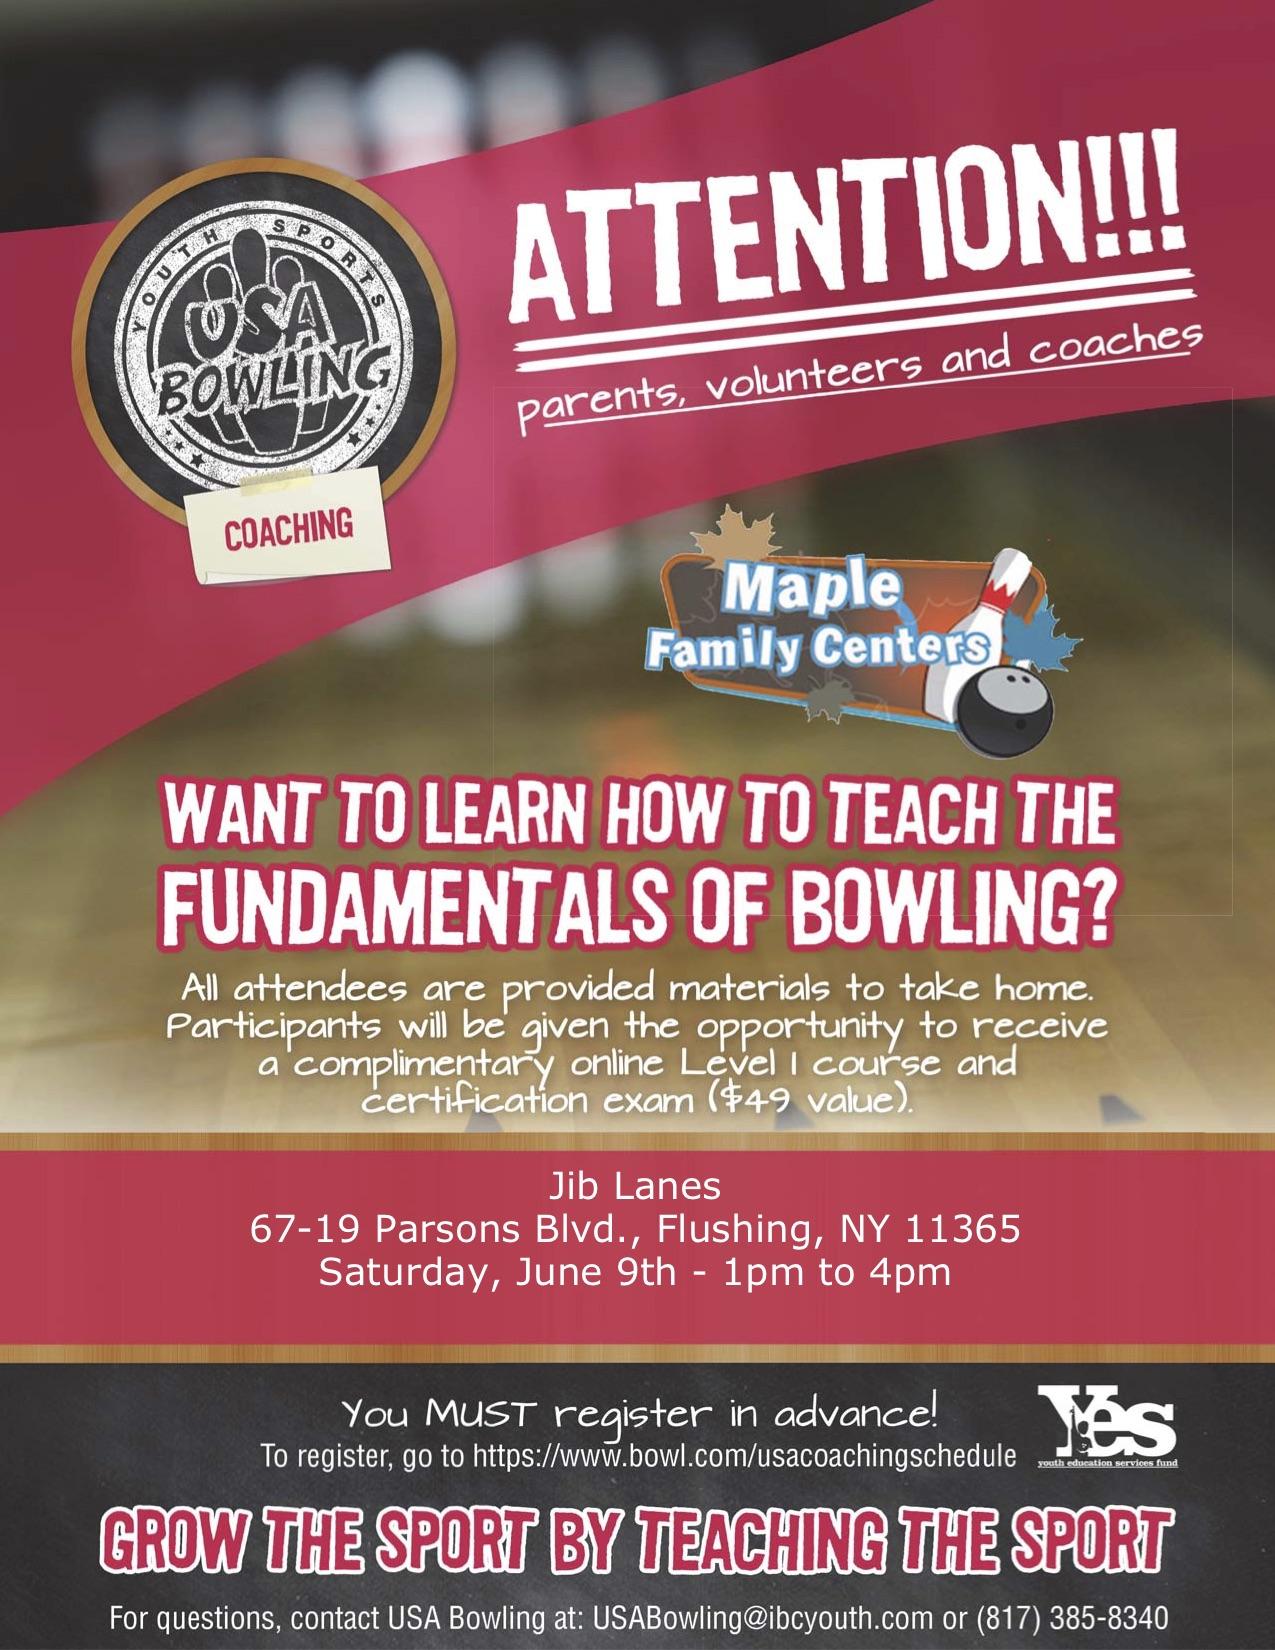 Jib Lanes-2018 USA Bowling Coaching Seminar Flyer